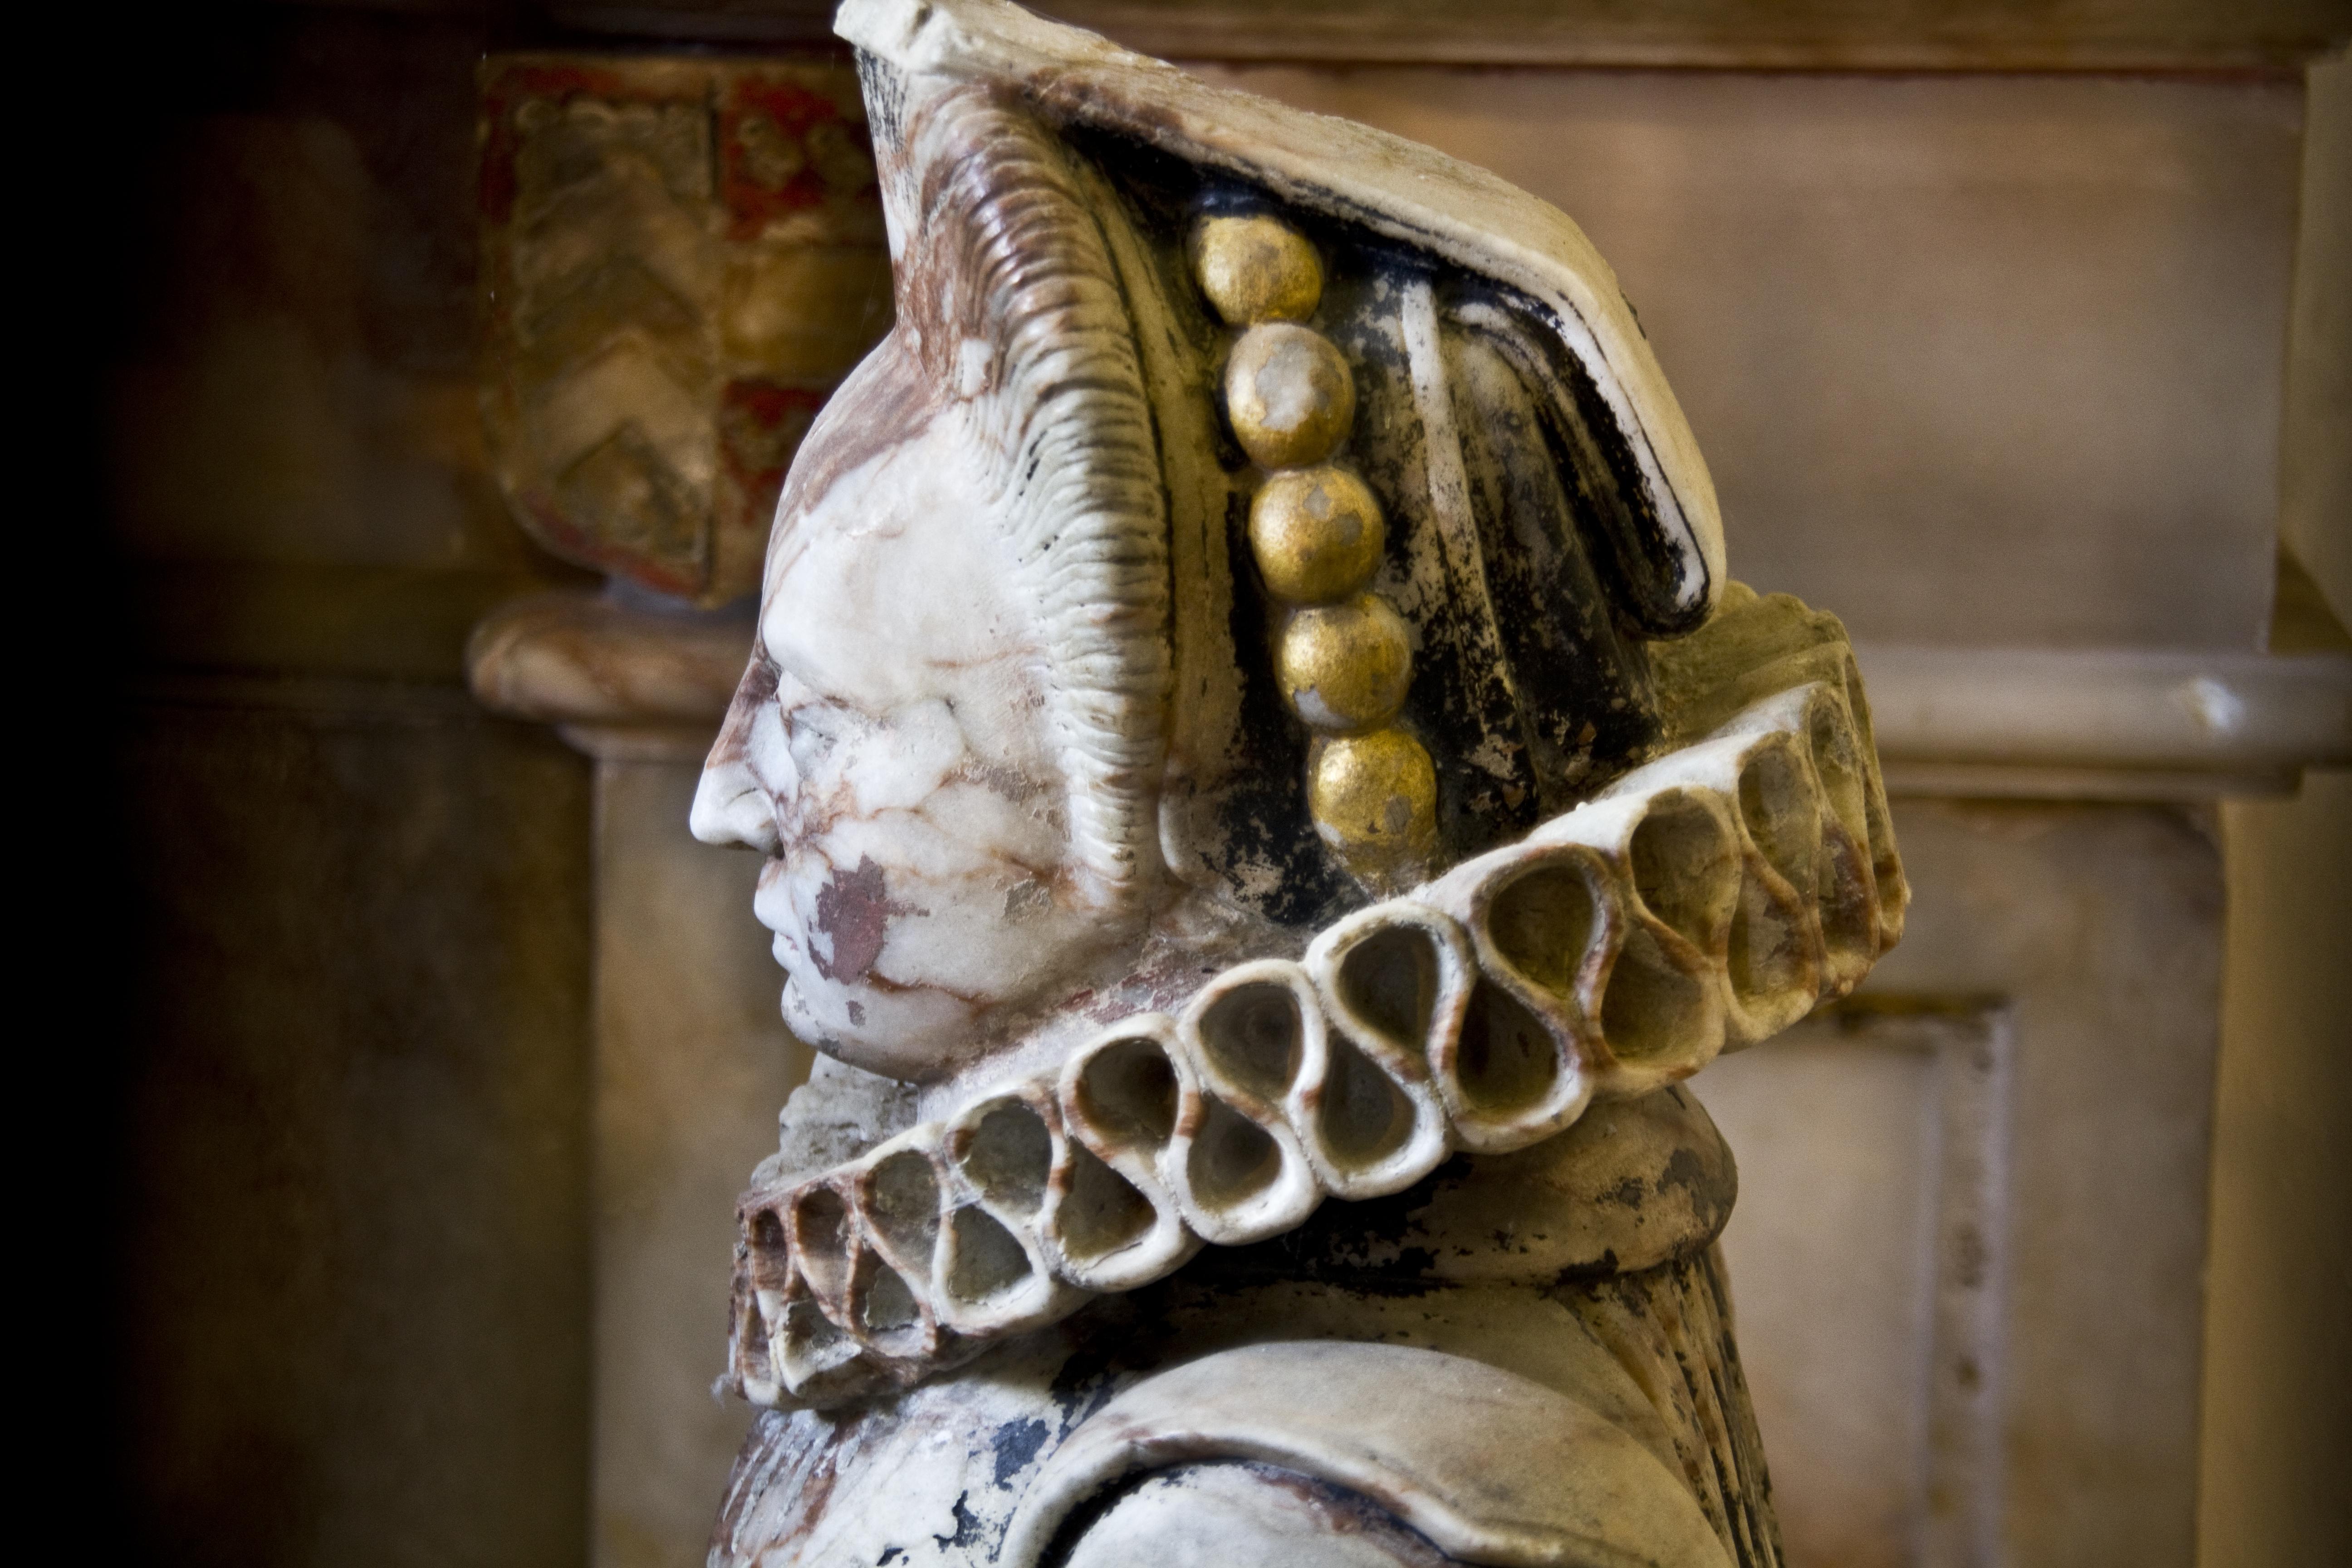 1608 - John and Elizabeth Croke